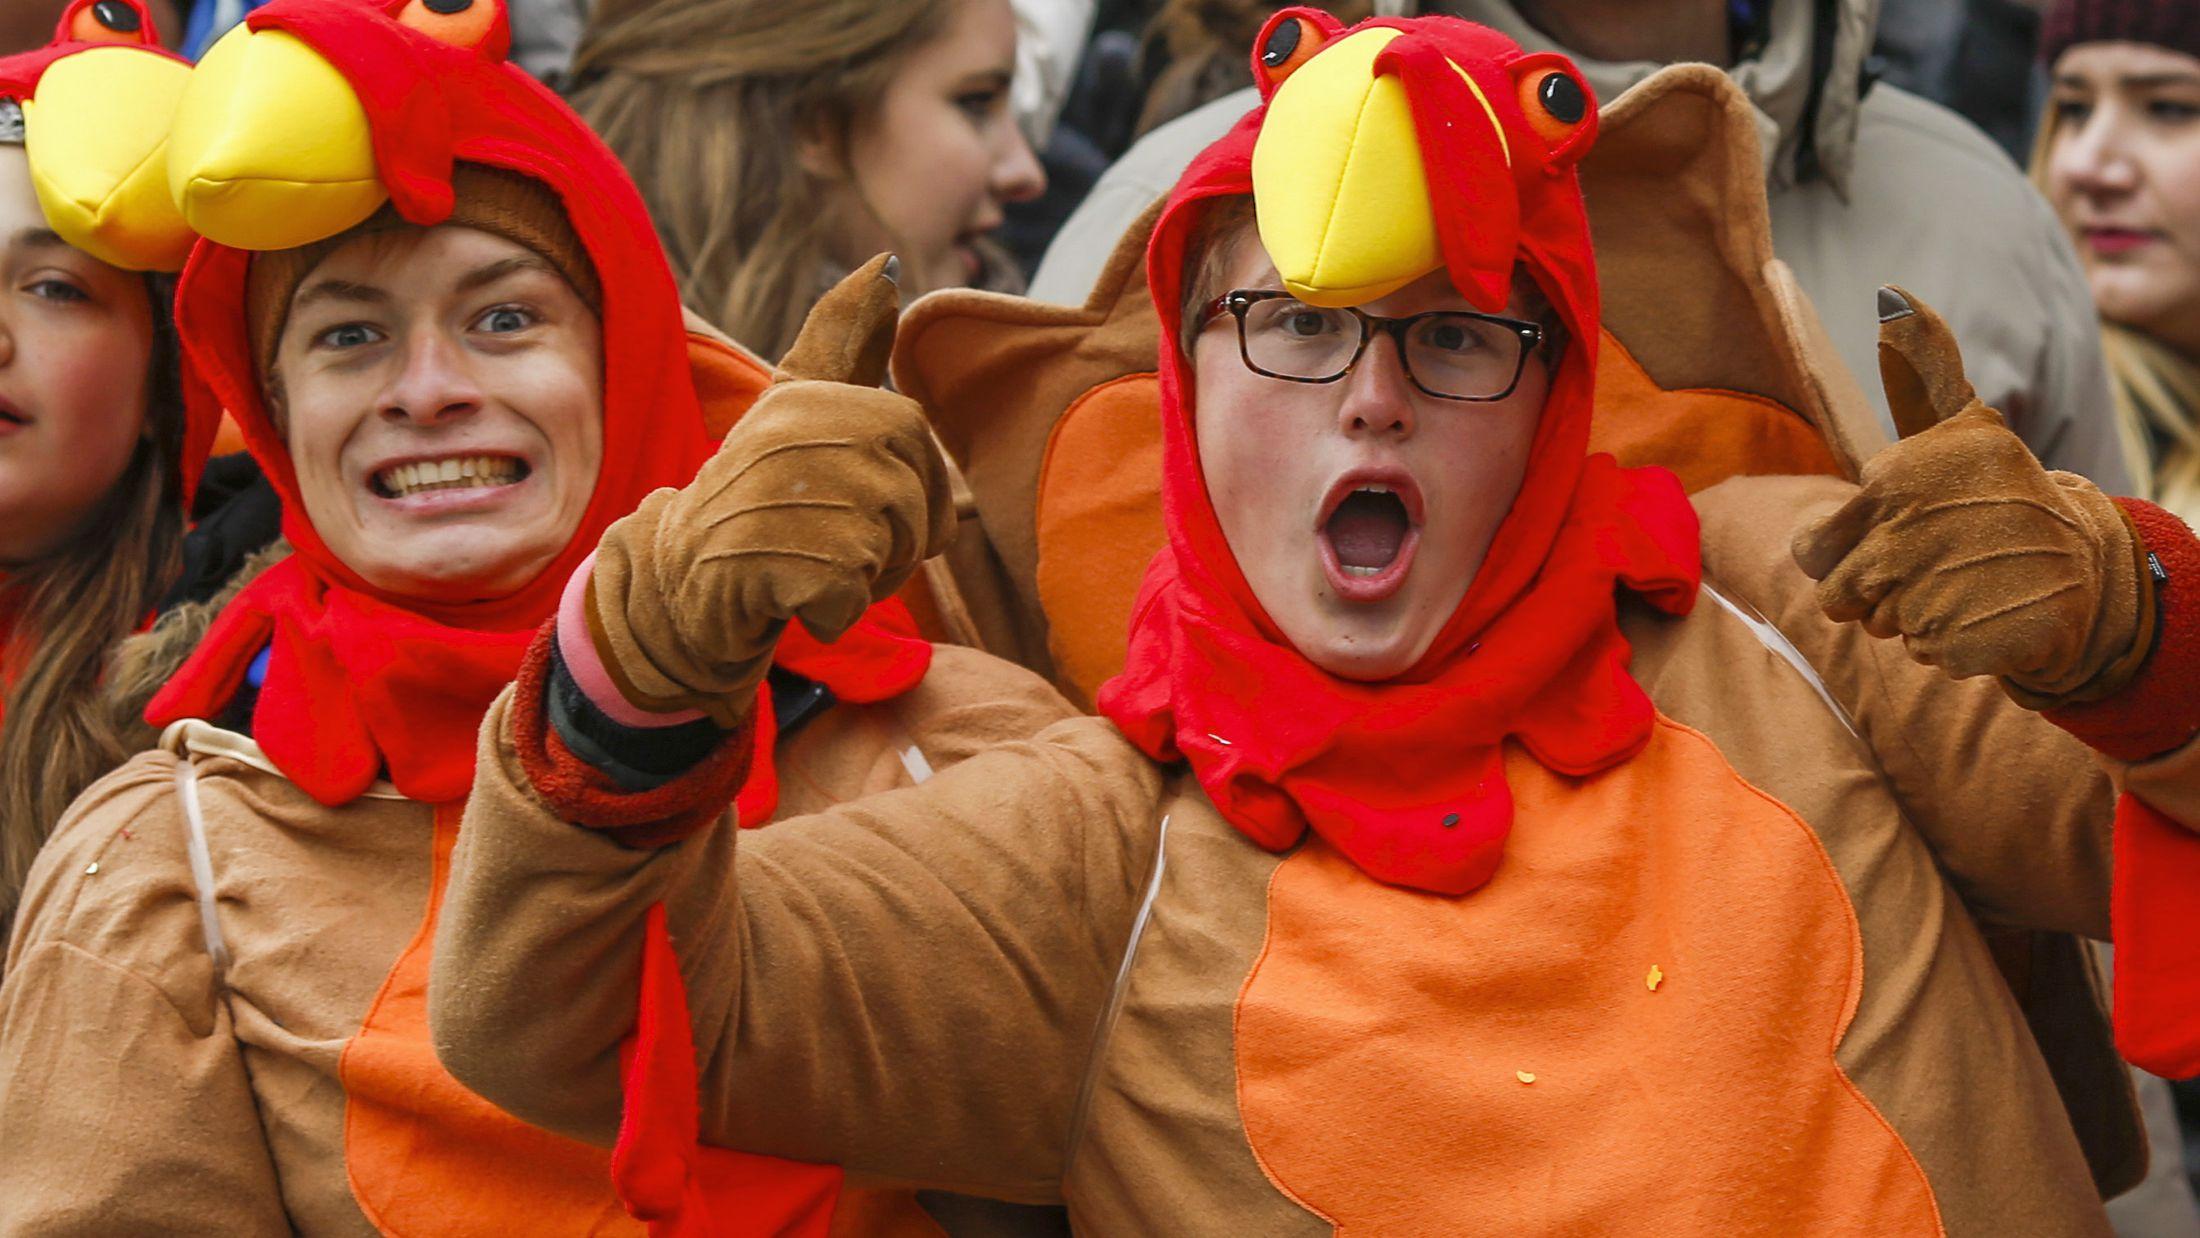 two men in turkey costumes